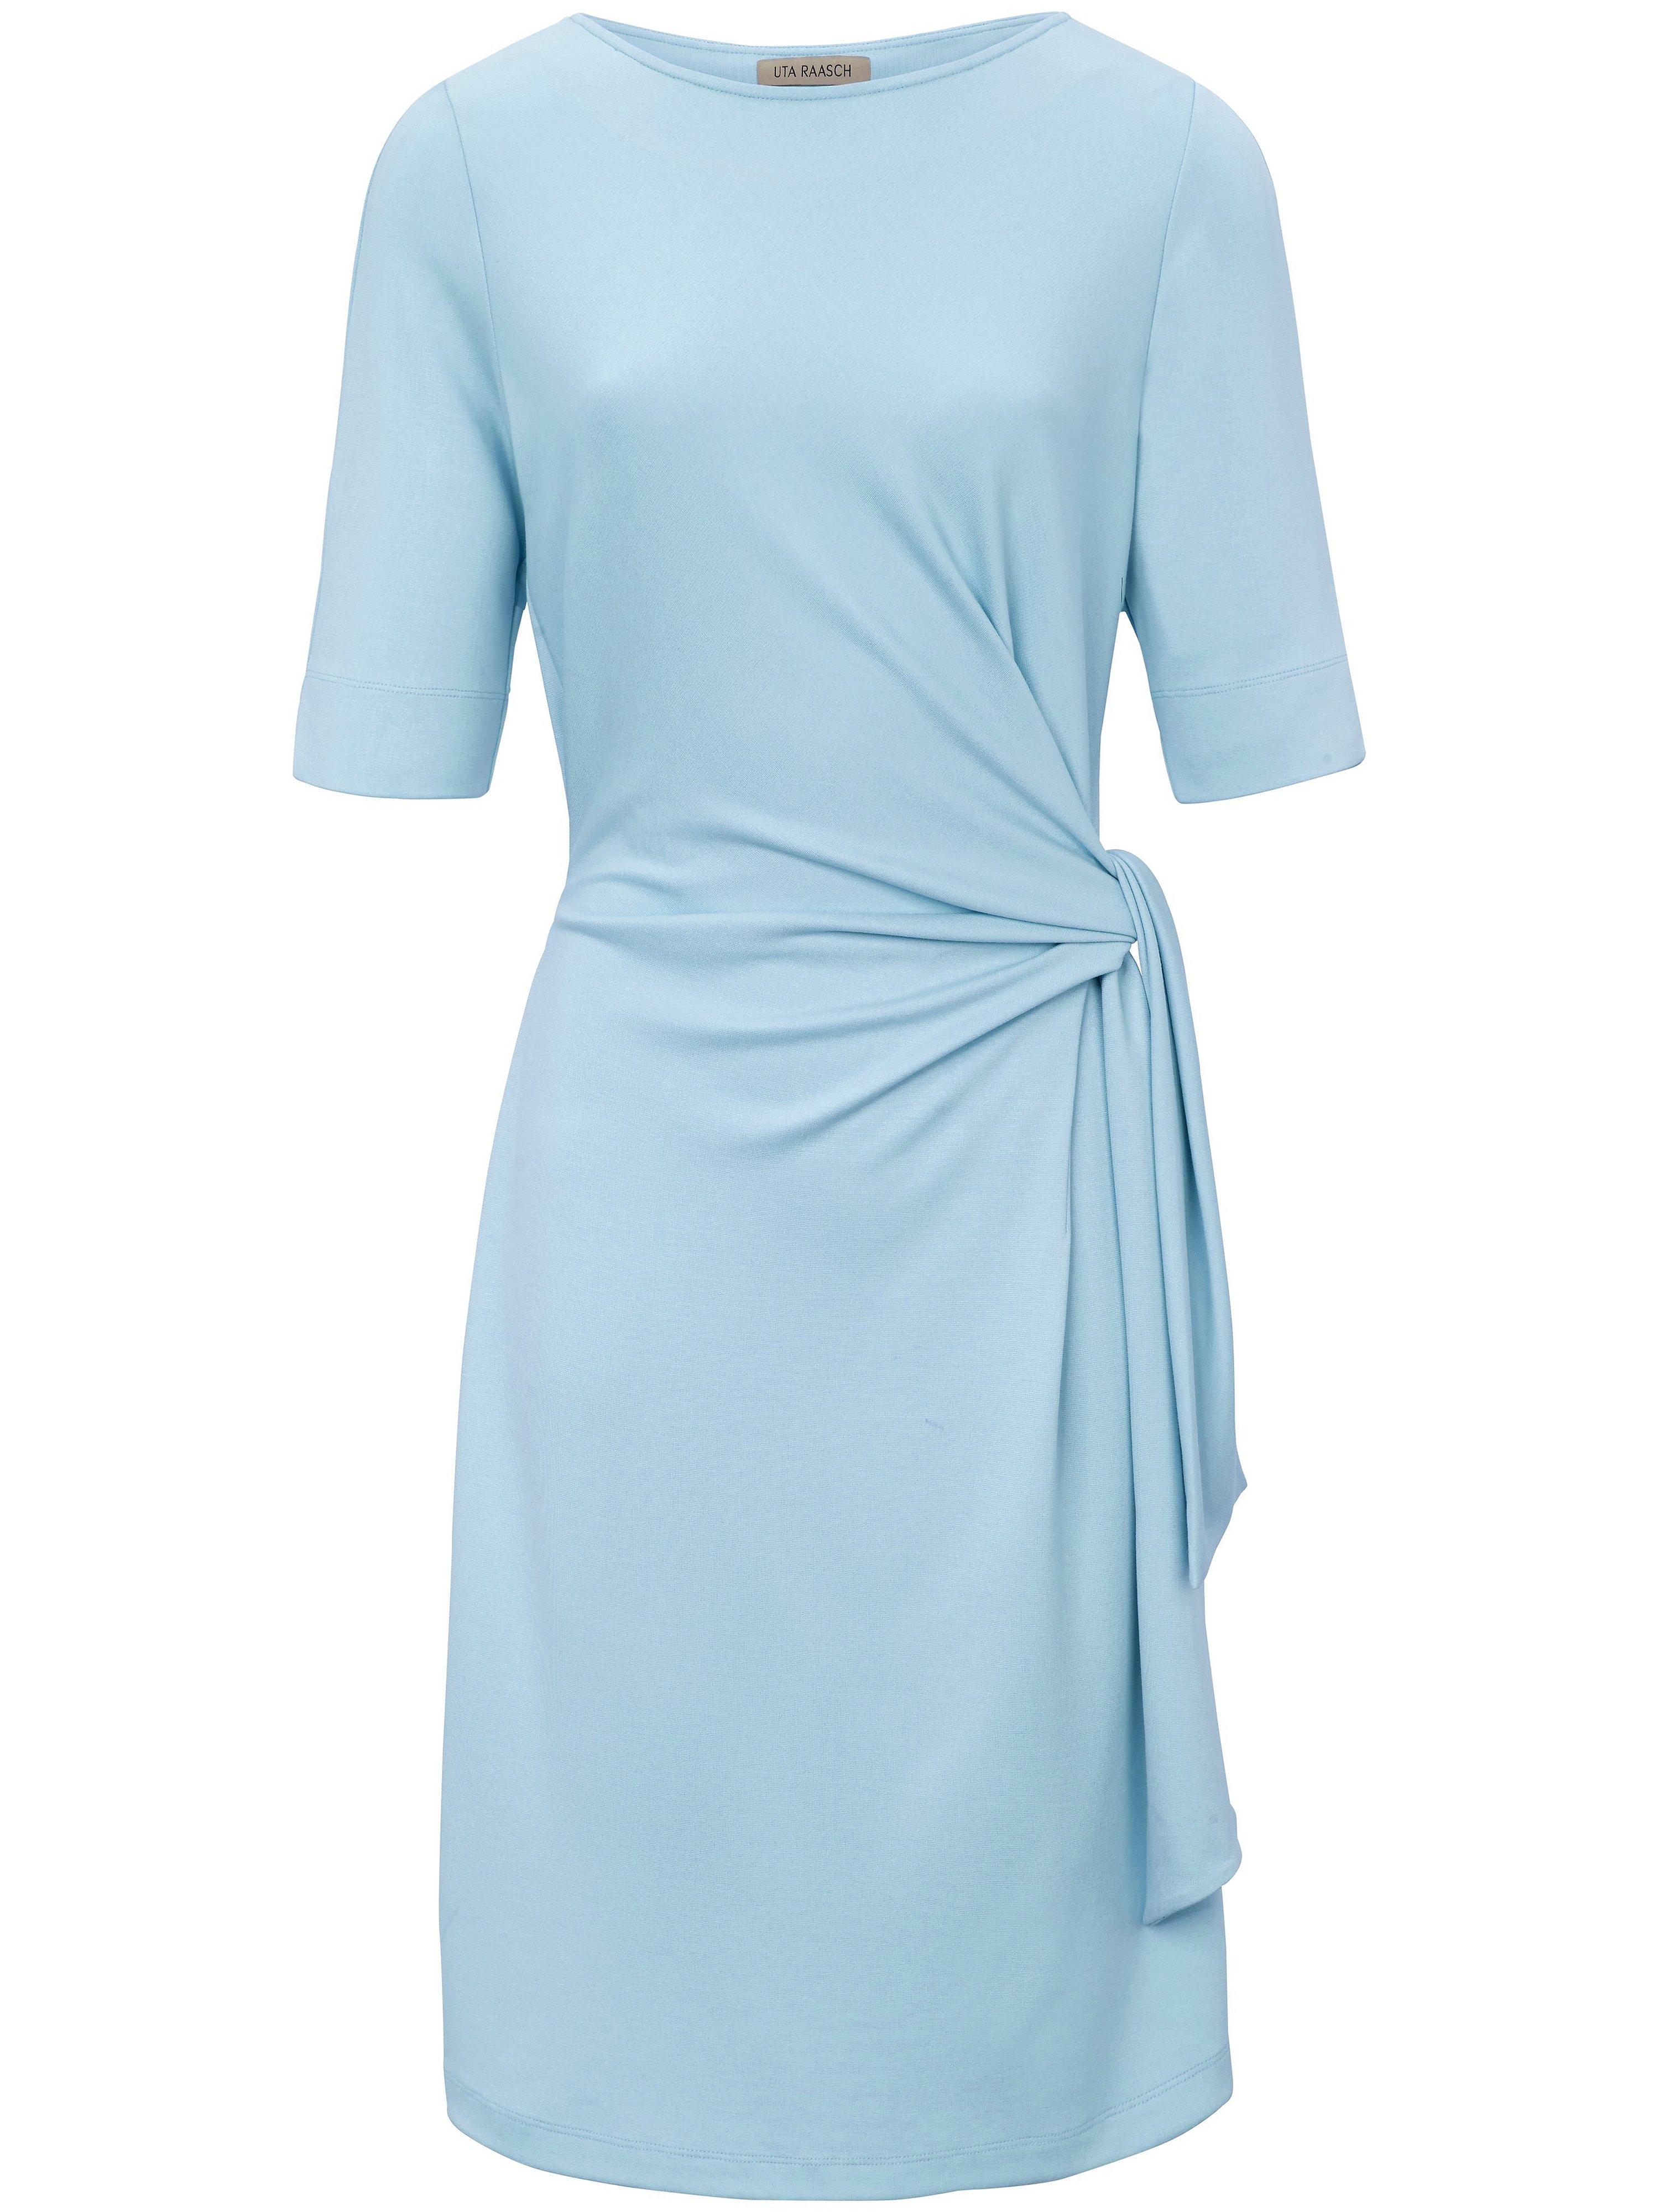 Jerseyjurk Van Uta Raasch blauw